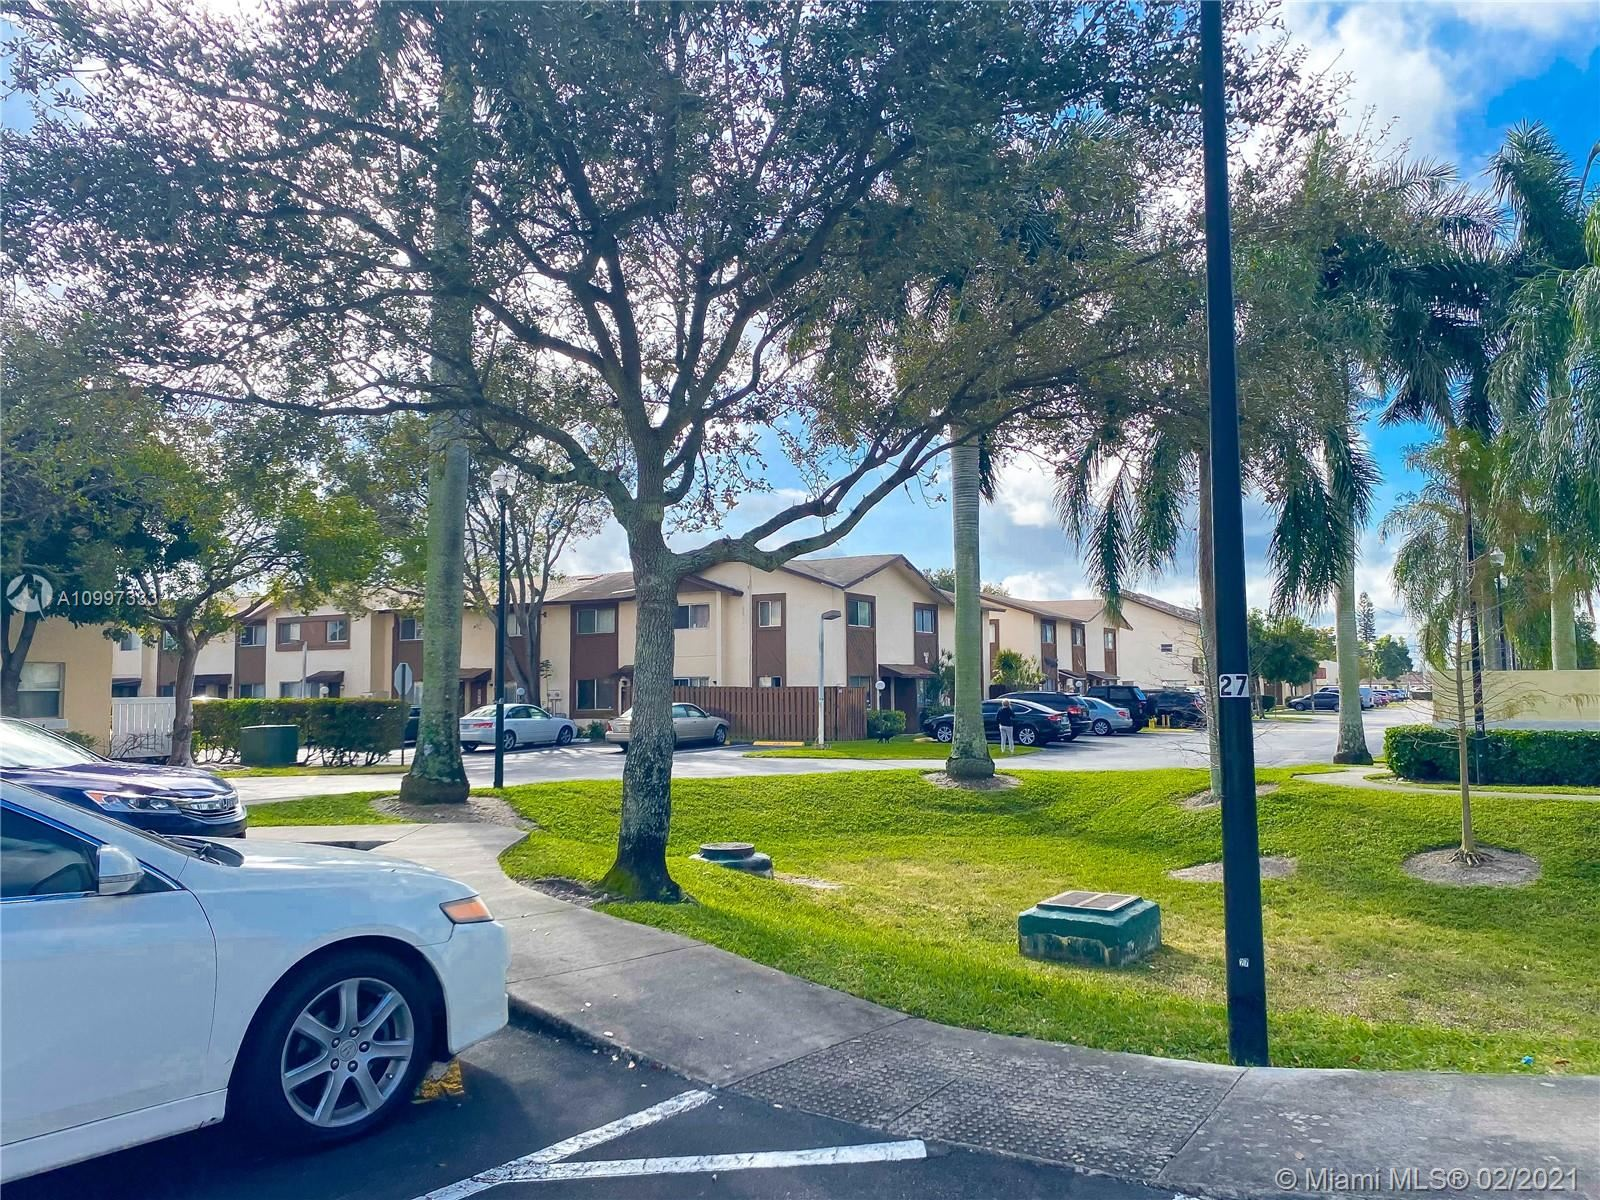 Photo of 6605 Winfield, Margate, FL 33063 (MLS # A10997333)